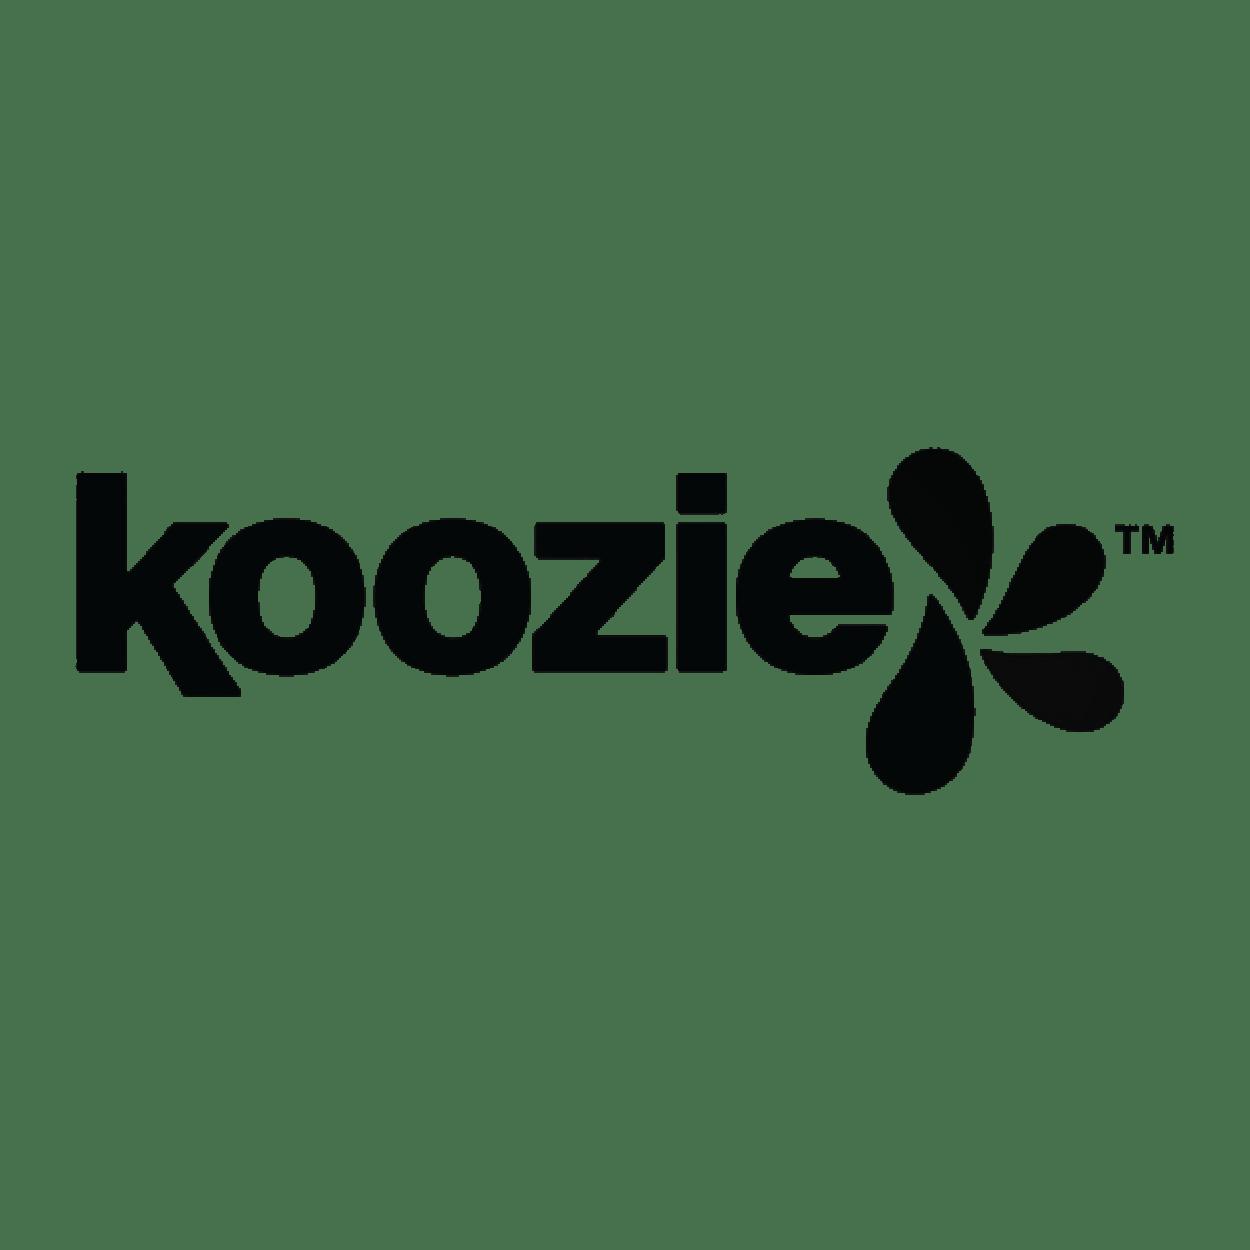 Koozie Logo - Popular Brand Promotional Products